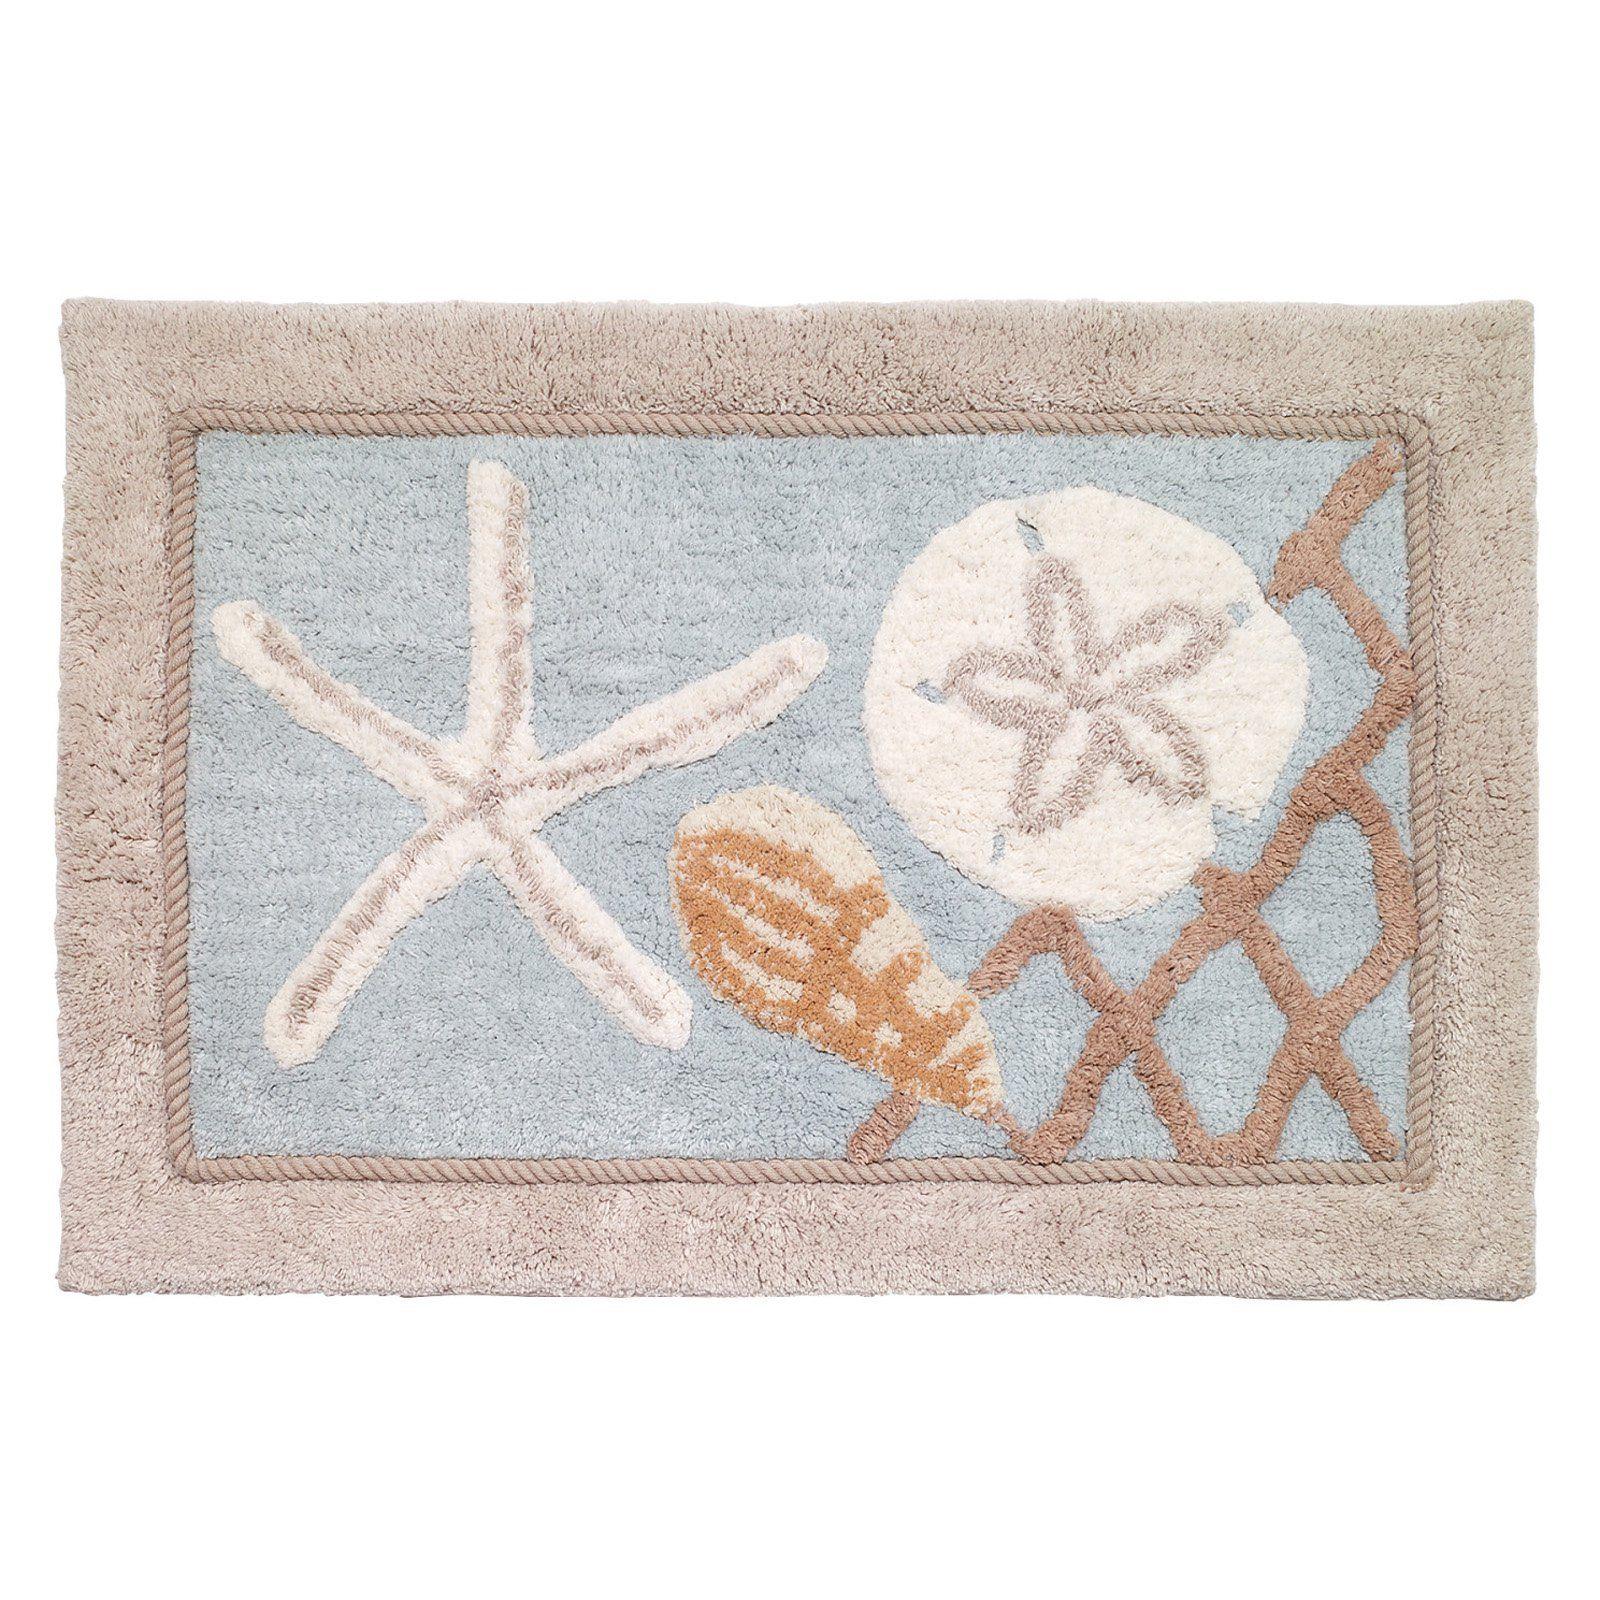 NEW Avanti Antigua Nautical Cotton Bath Rug